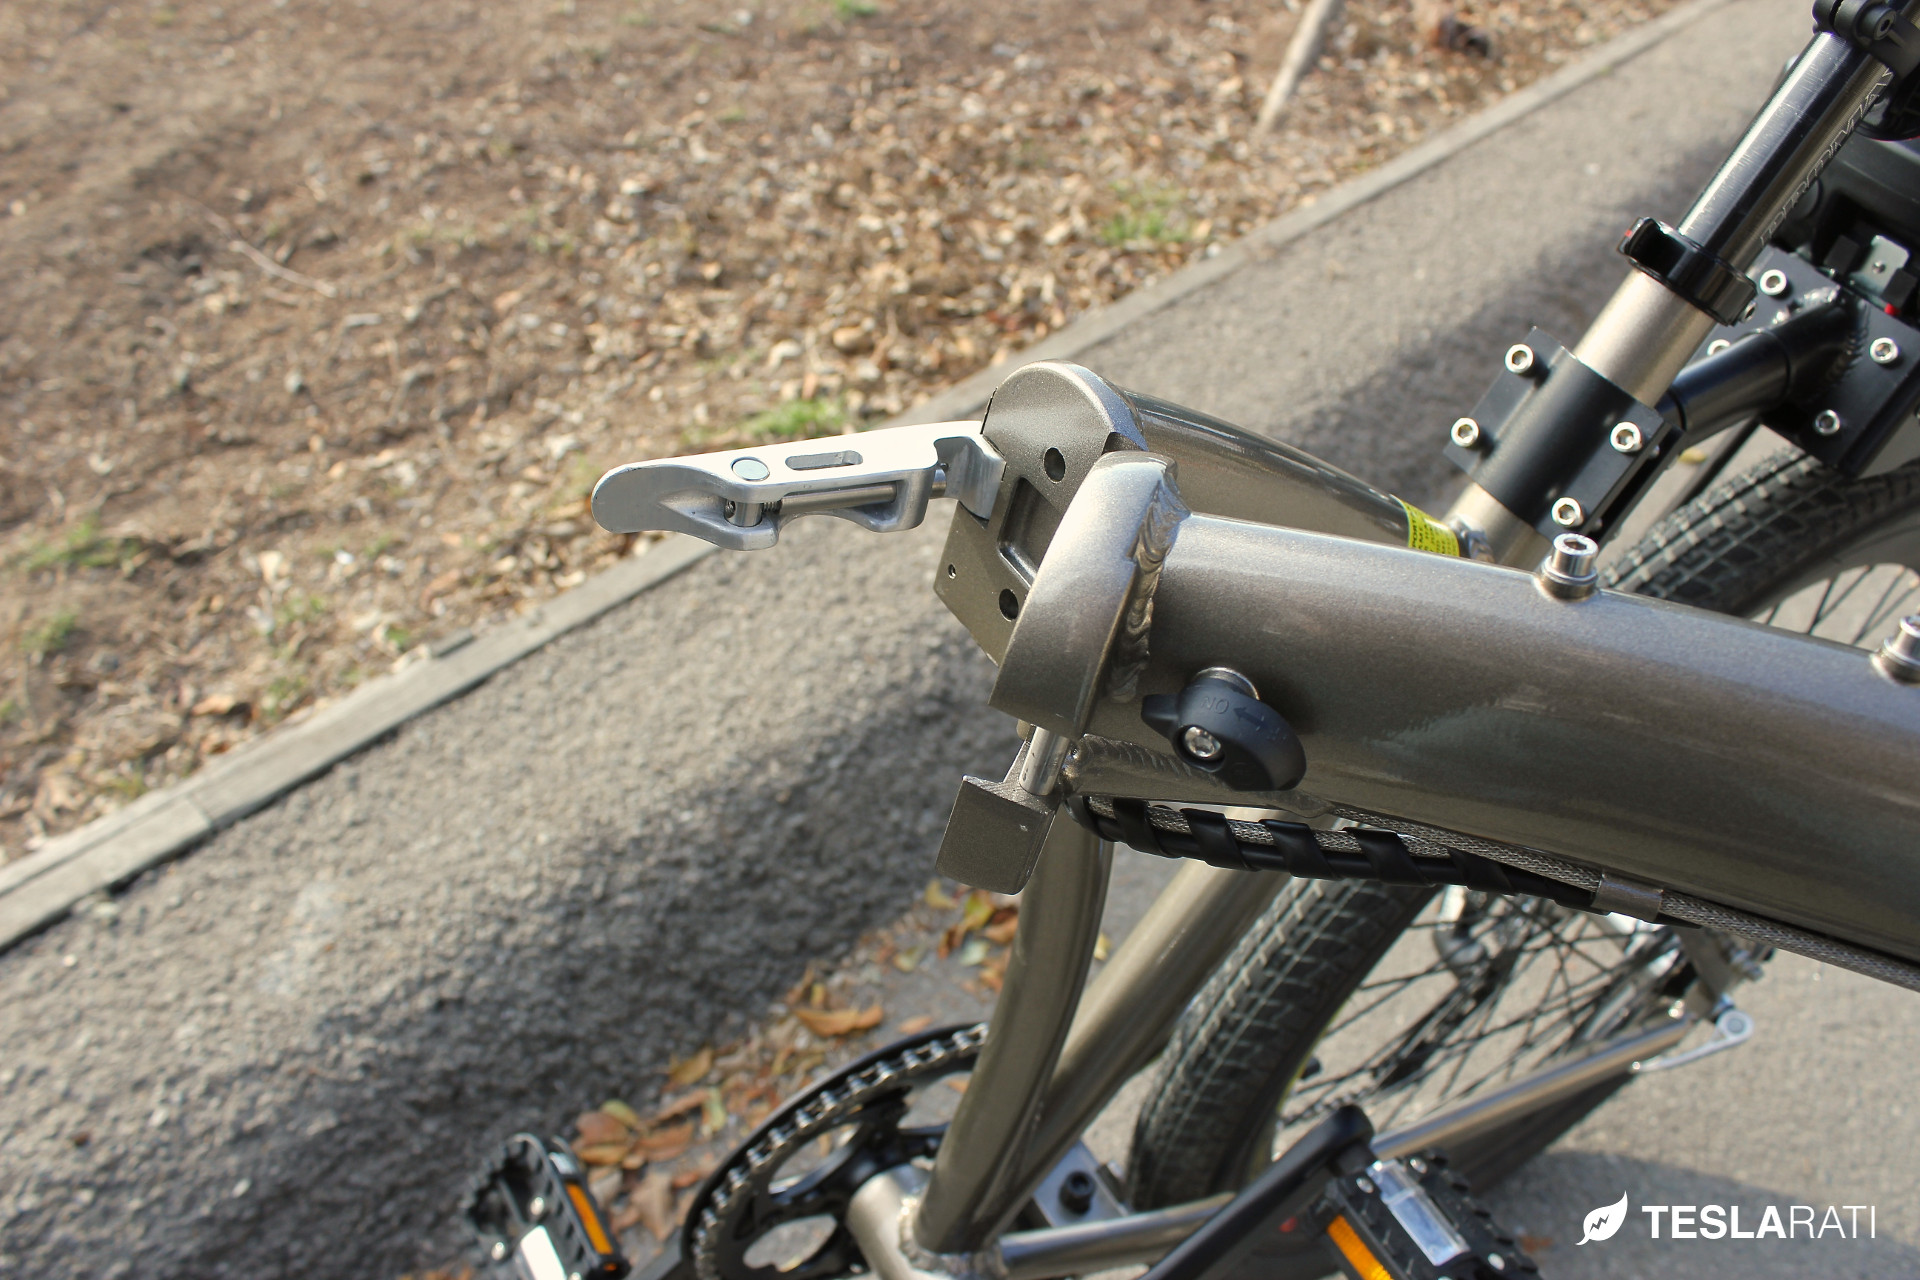 Tesla-Folding-Electric-Bike-Prodeco-17